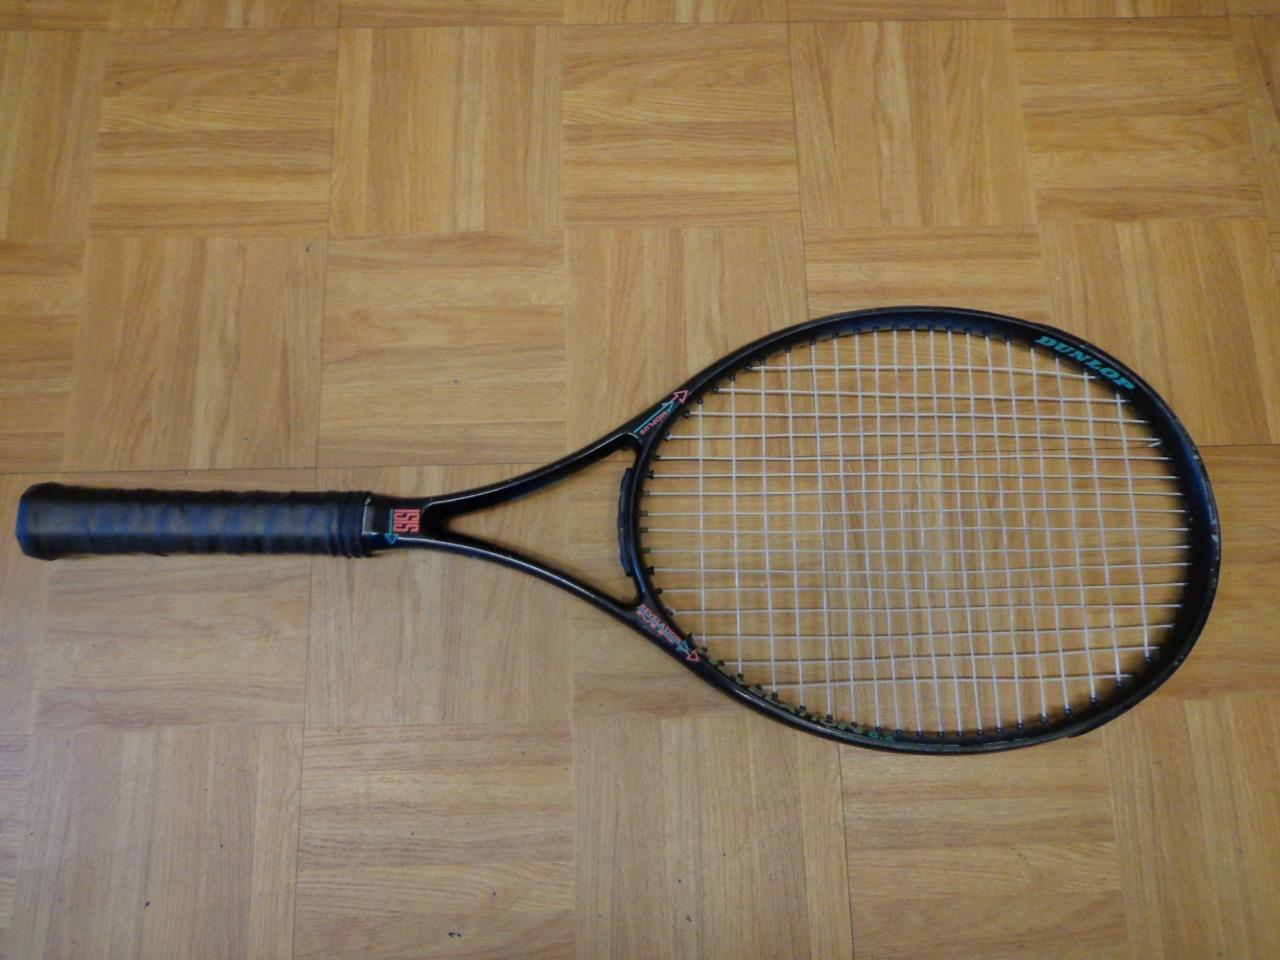 Dunlop Mid Profile Revelation 95 head 4 1 2 grip Tennis Racquet